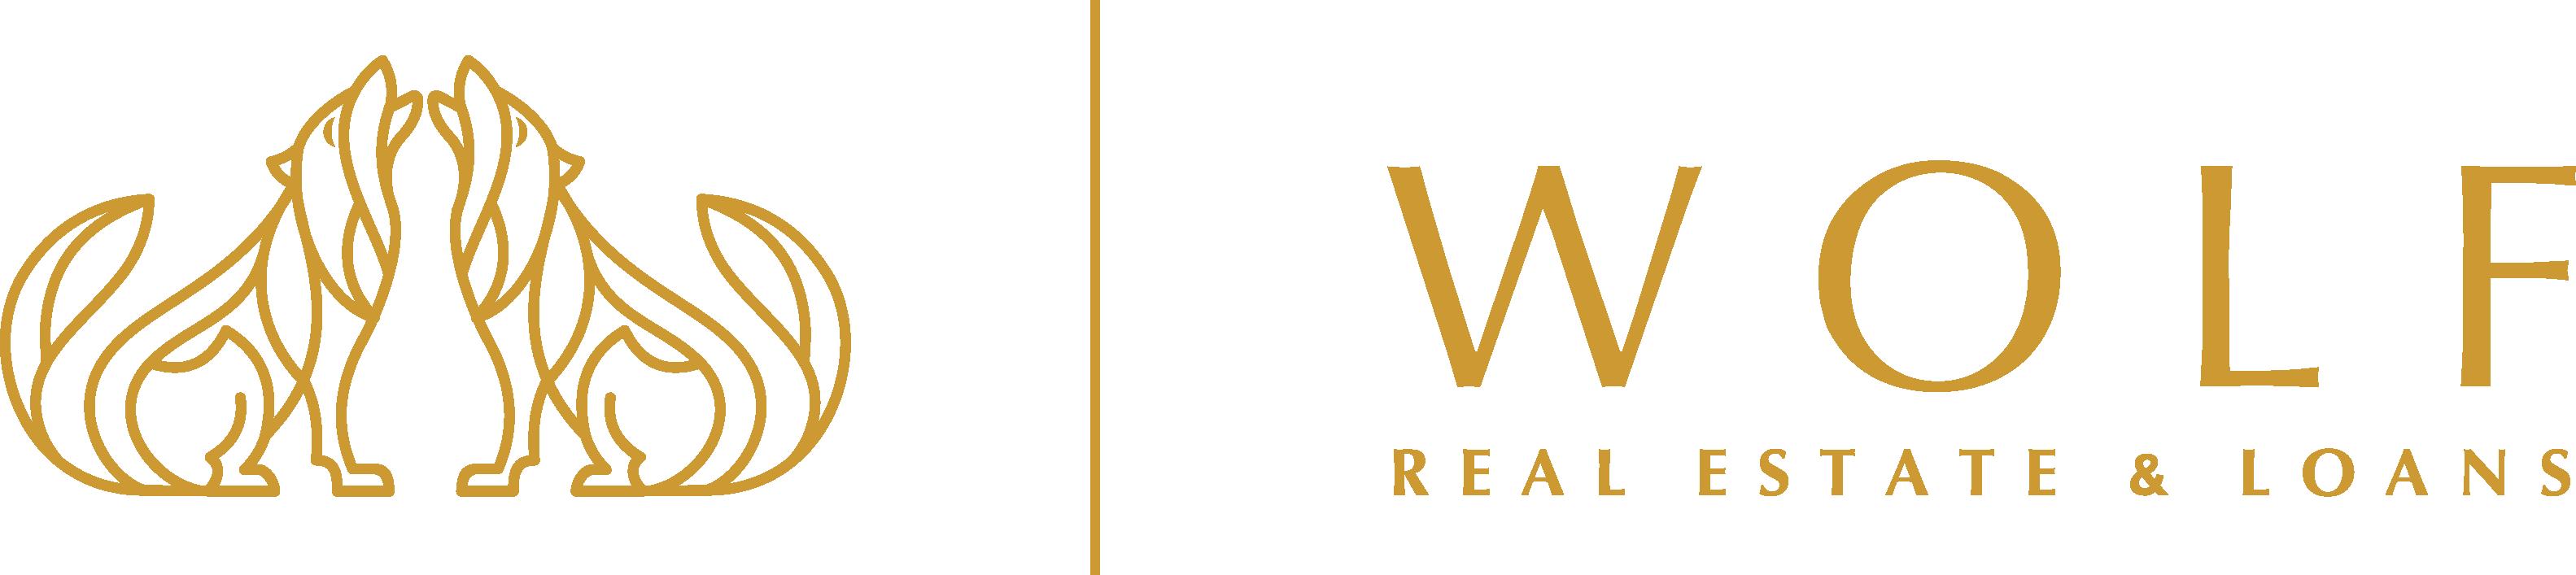 Wolf Real Estate & Loans logo